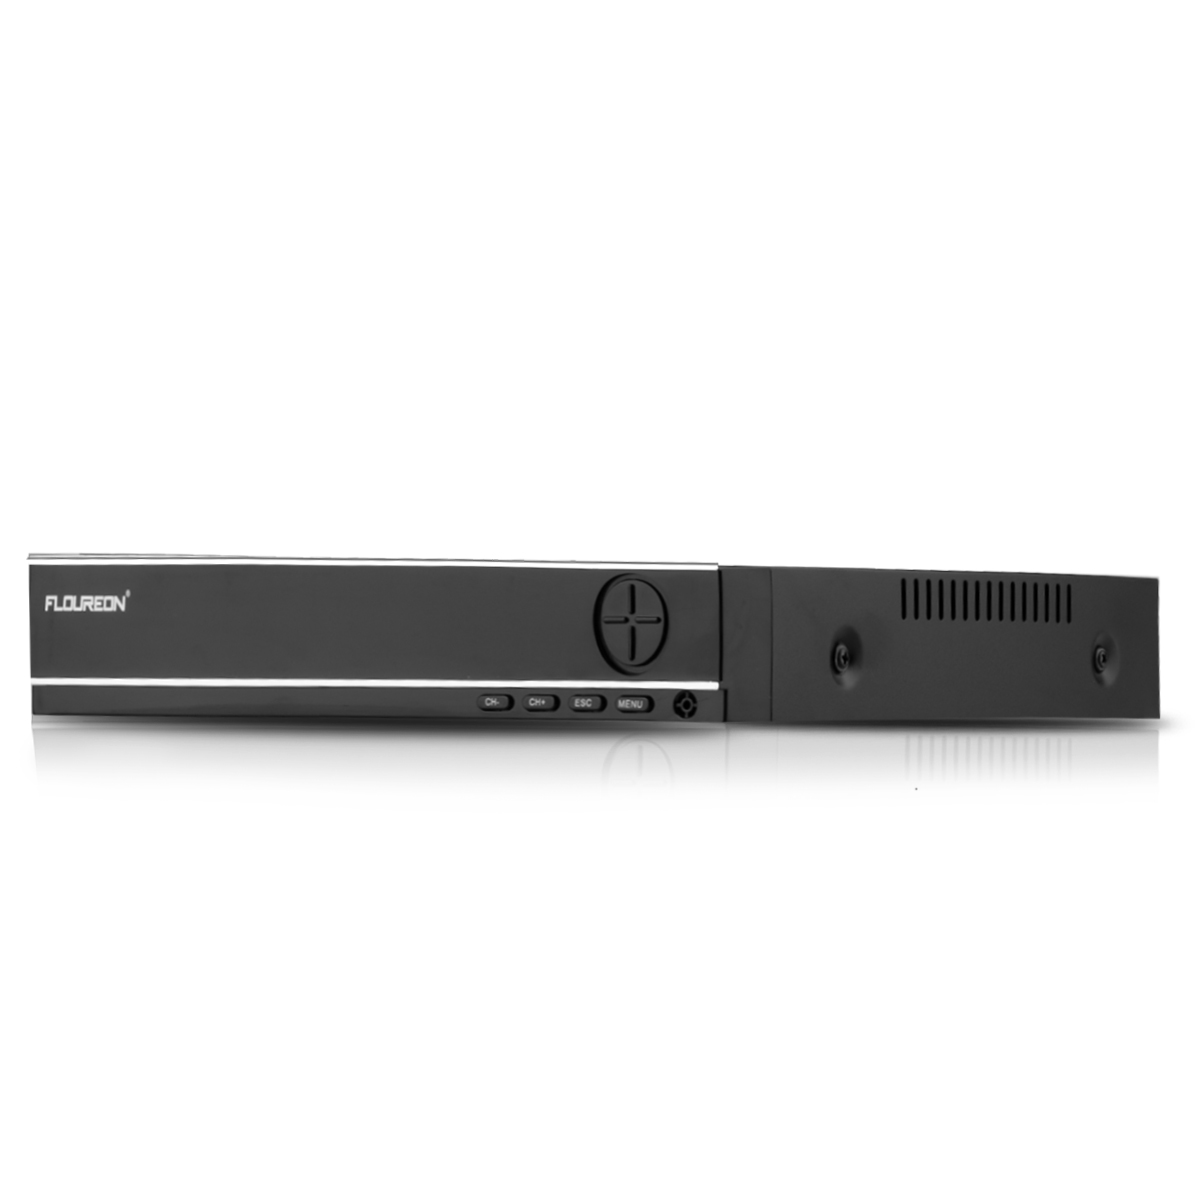 FLOUREON 5 IN 1 AHD DVR Unterstützung TVI/CVI/AHD/Analog/IP Kameras 8 Kanäle 1080N HDMI H.264 CCTV Sicherheit Video Recorder DVR